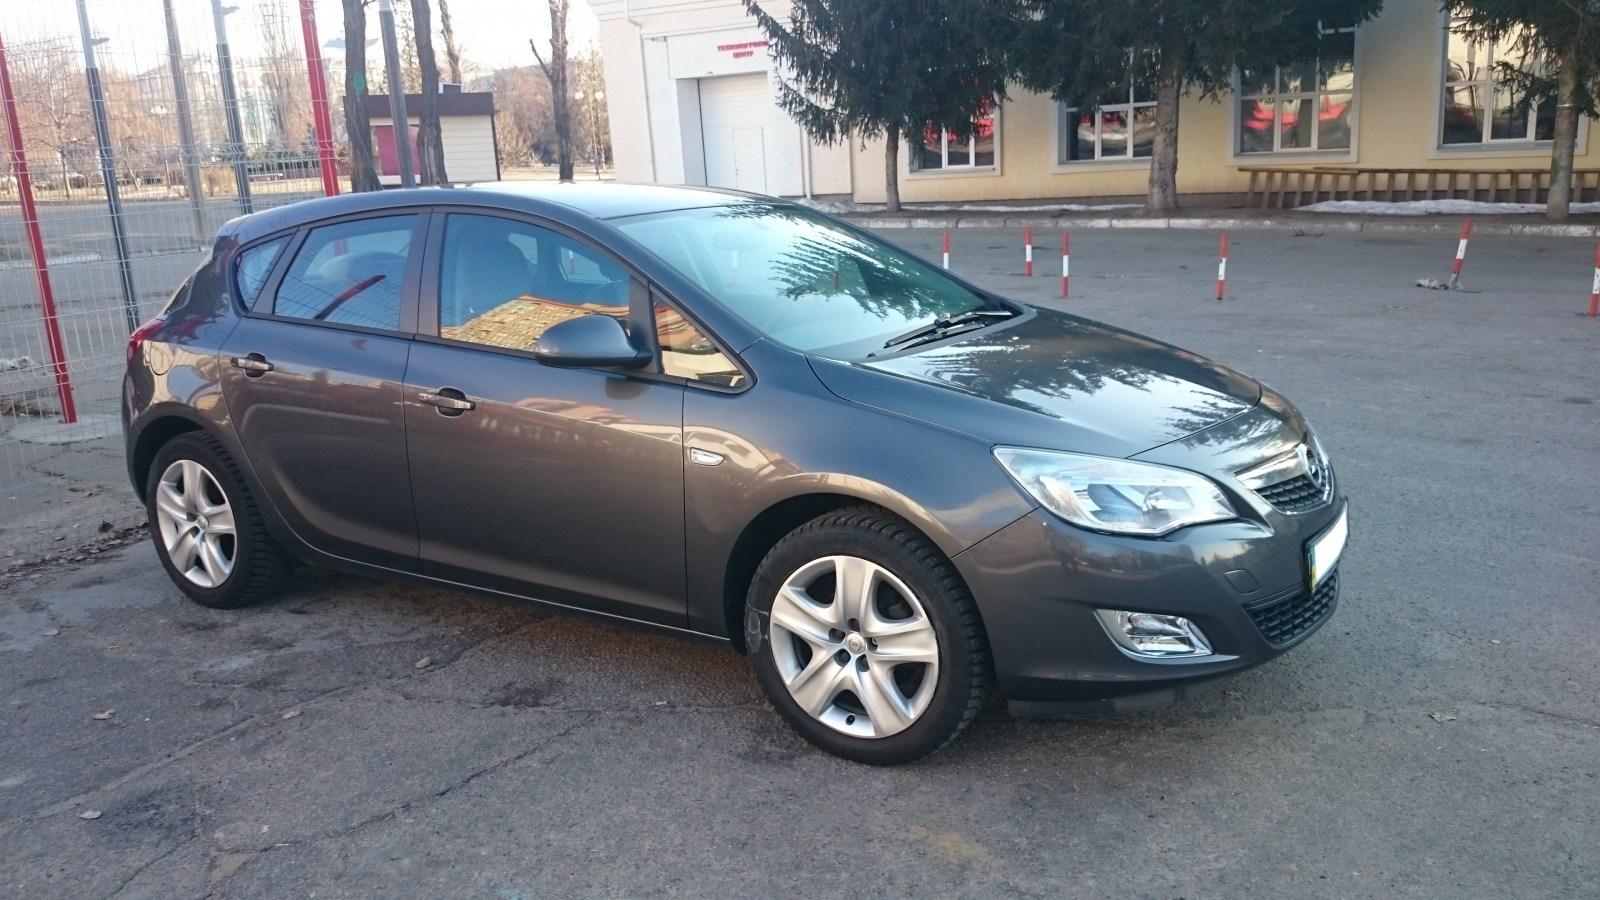 Авторынок | Продажа 2011 Opel Astra Astra J